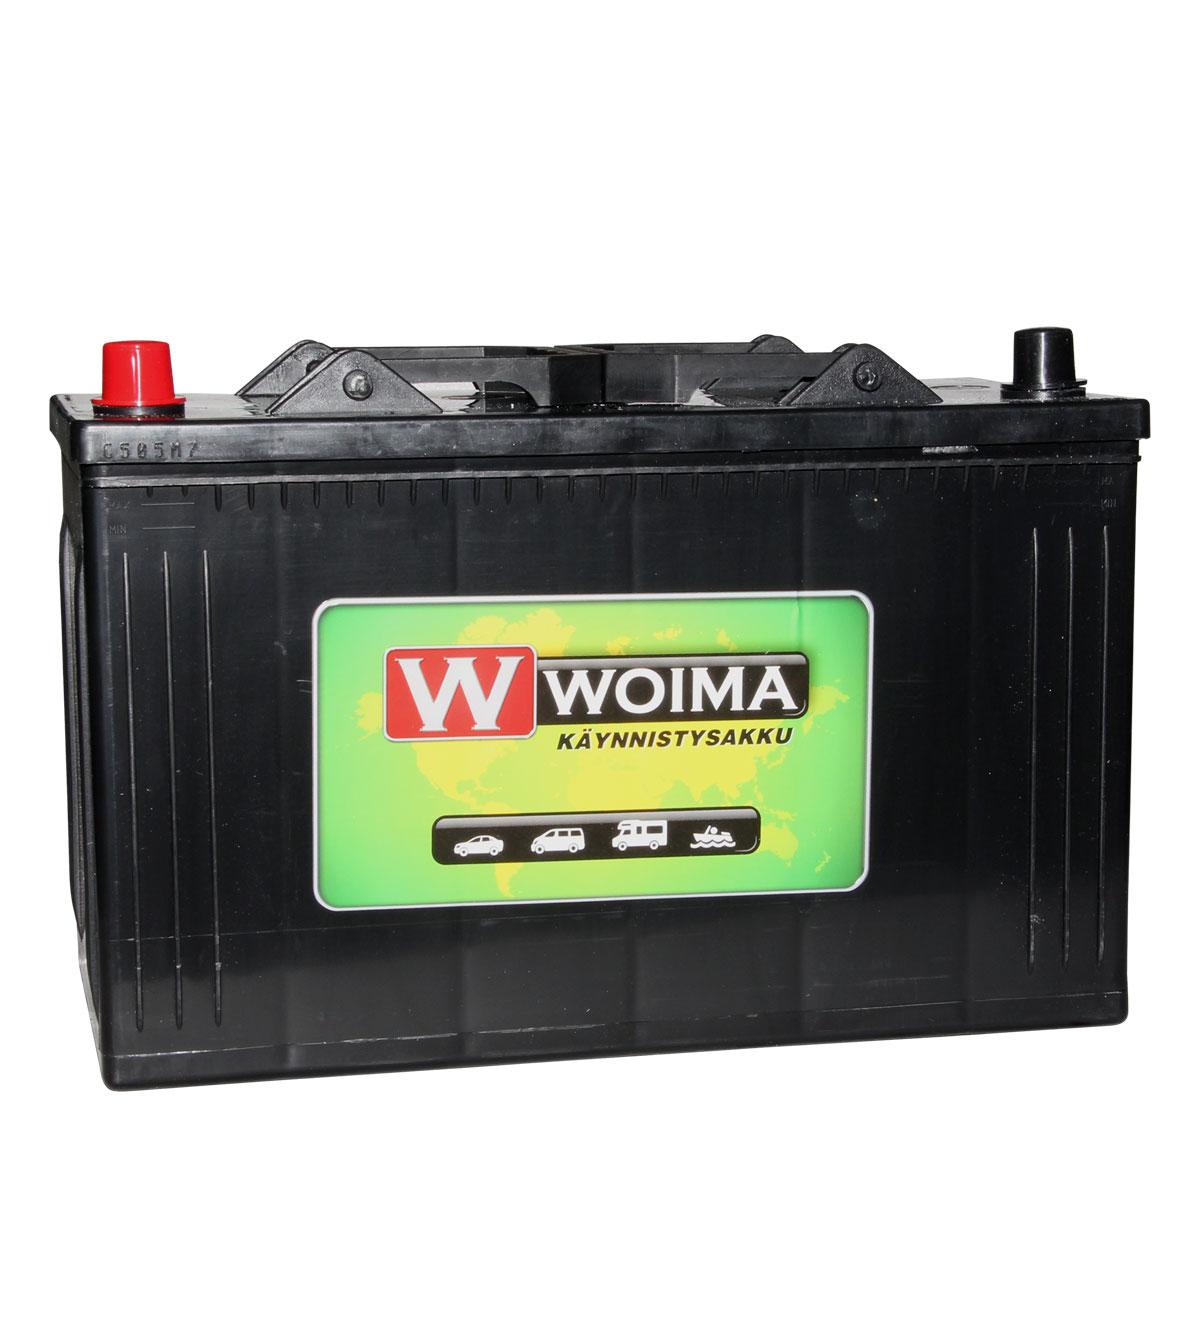 Woima HD 105Ah 720A 345x175x233 +/- käynnistysakku